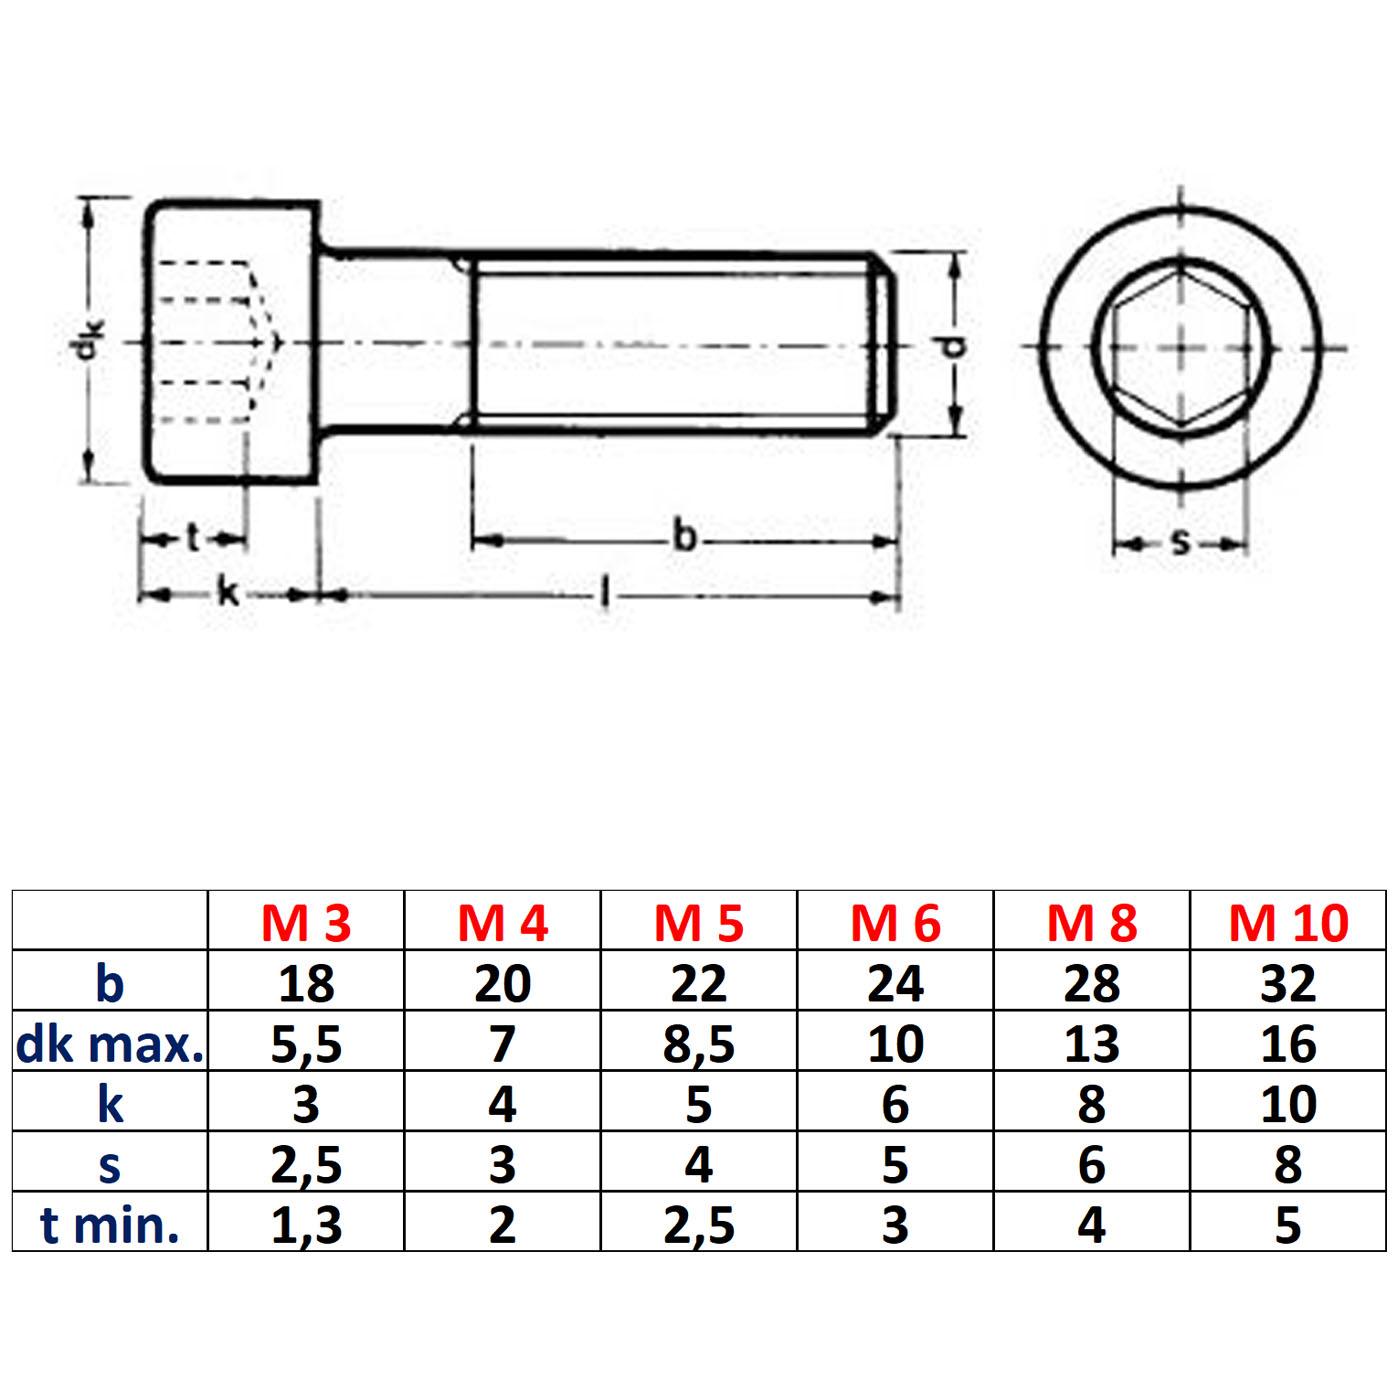 1000 St/ück M10 x 25 mm Zylinderschrauben DIN 912 Edelstahl A4 VA V4A Innensechskant Zylinderkopf